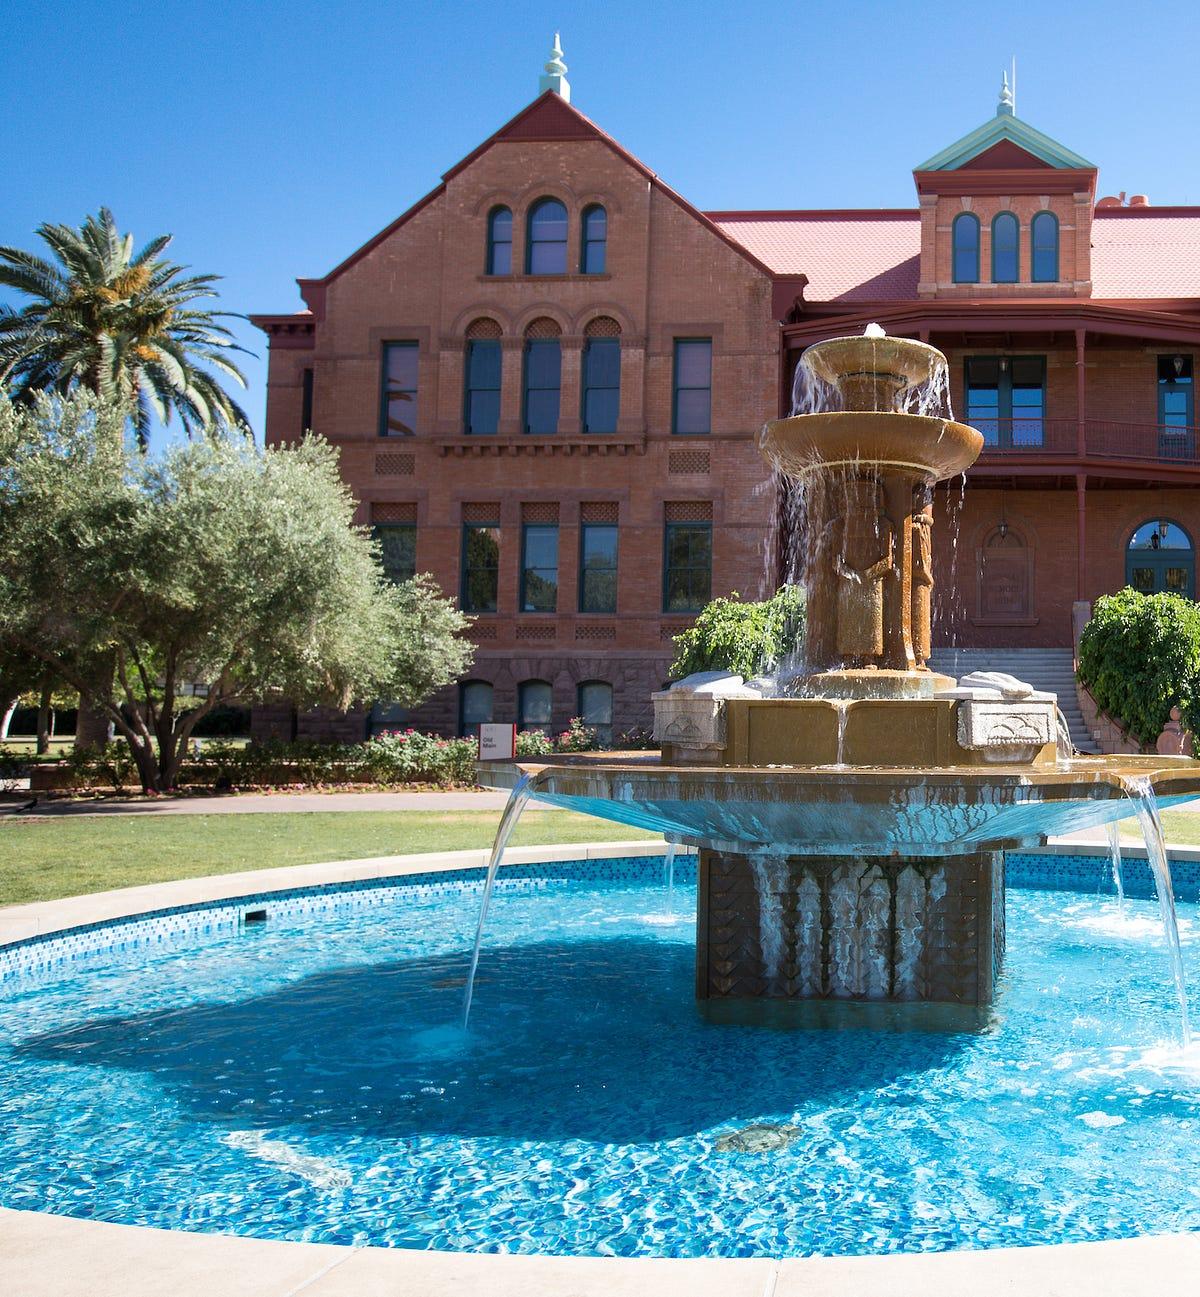 7 places to visit on ASU Tempe campus – Arizona State ...